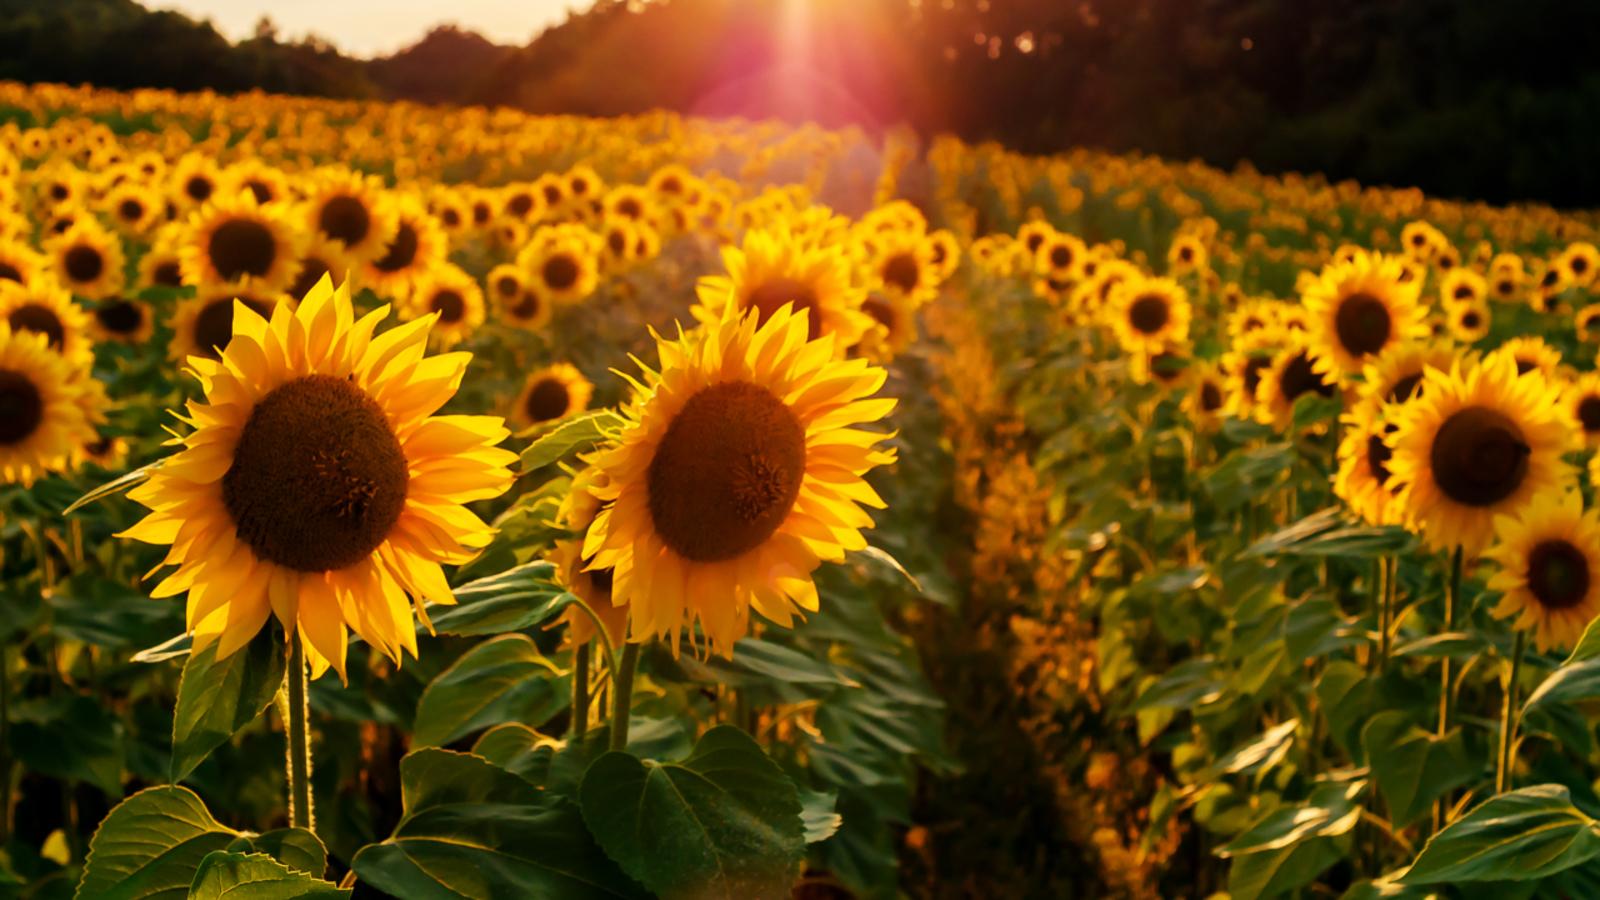 sunflower sunseed подсолнечник